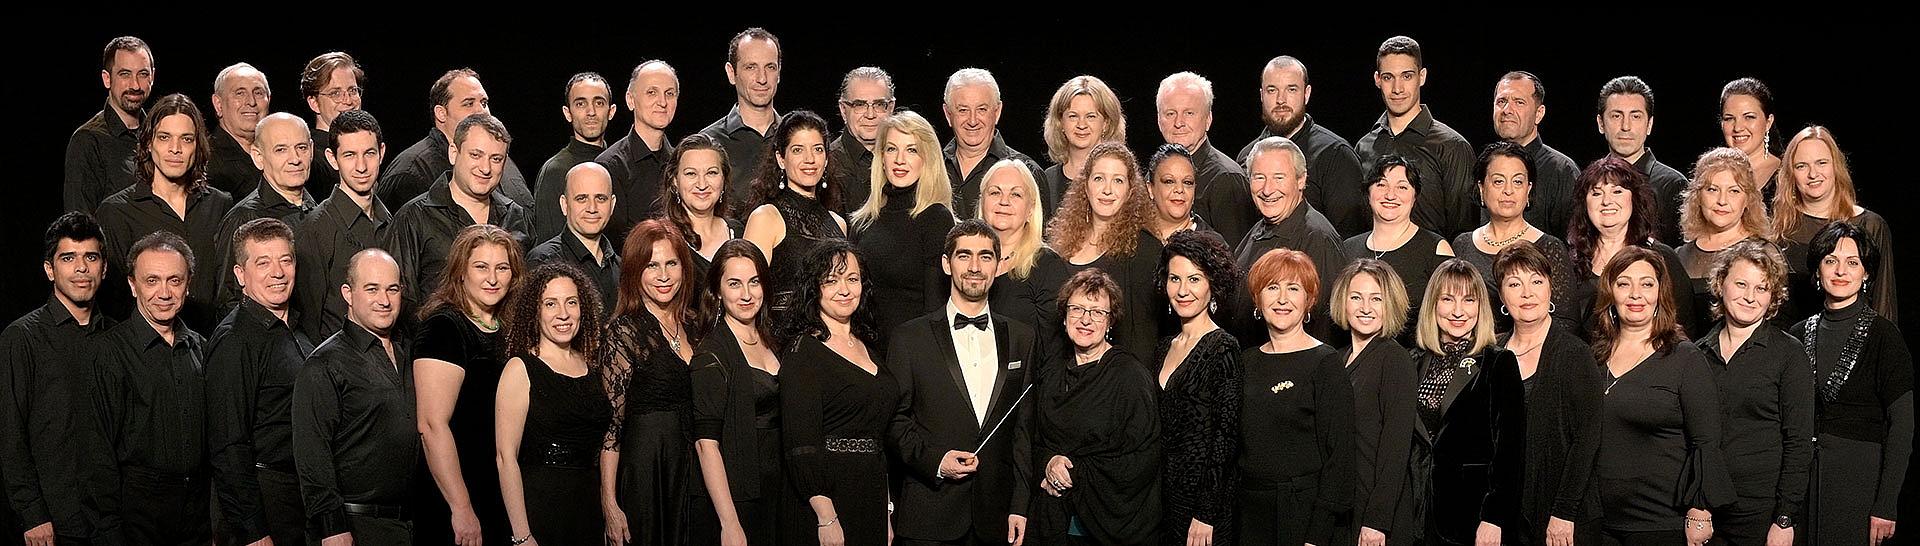 The Israeli Opera Chorus